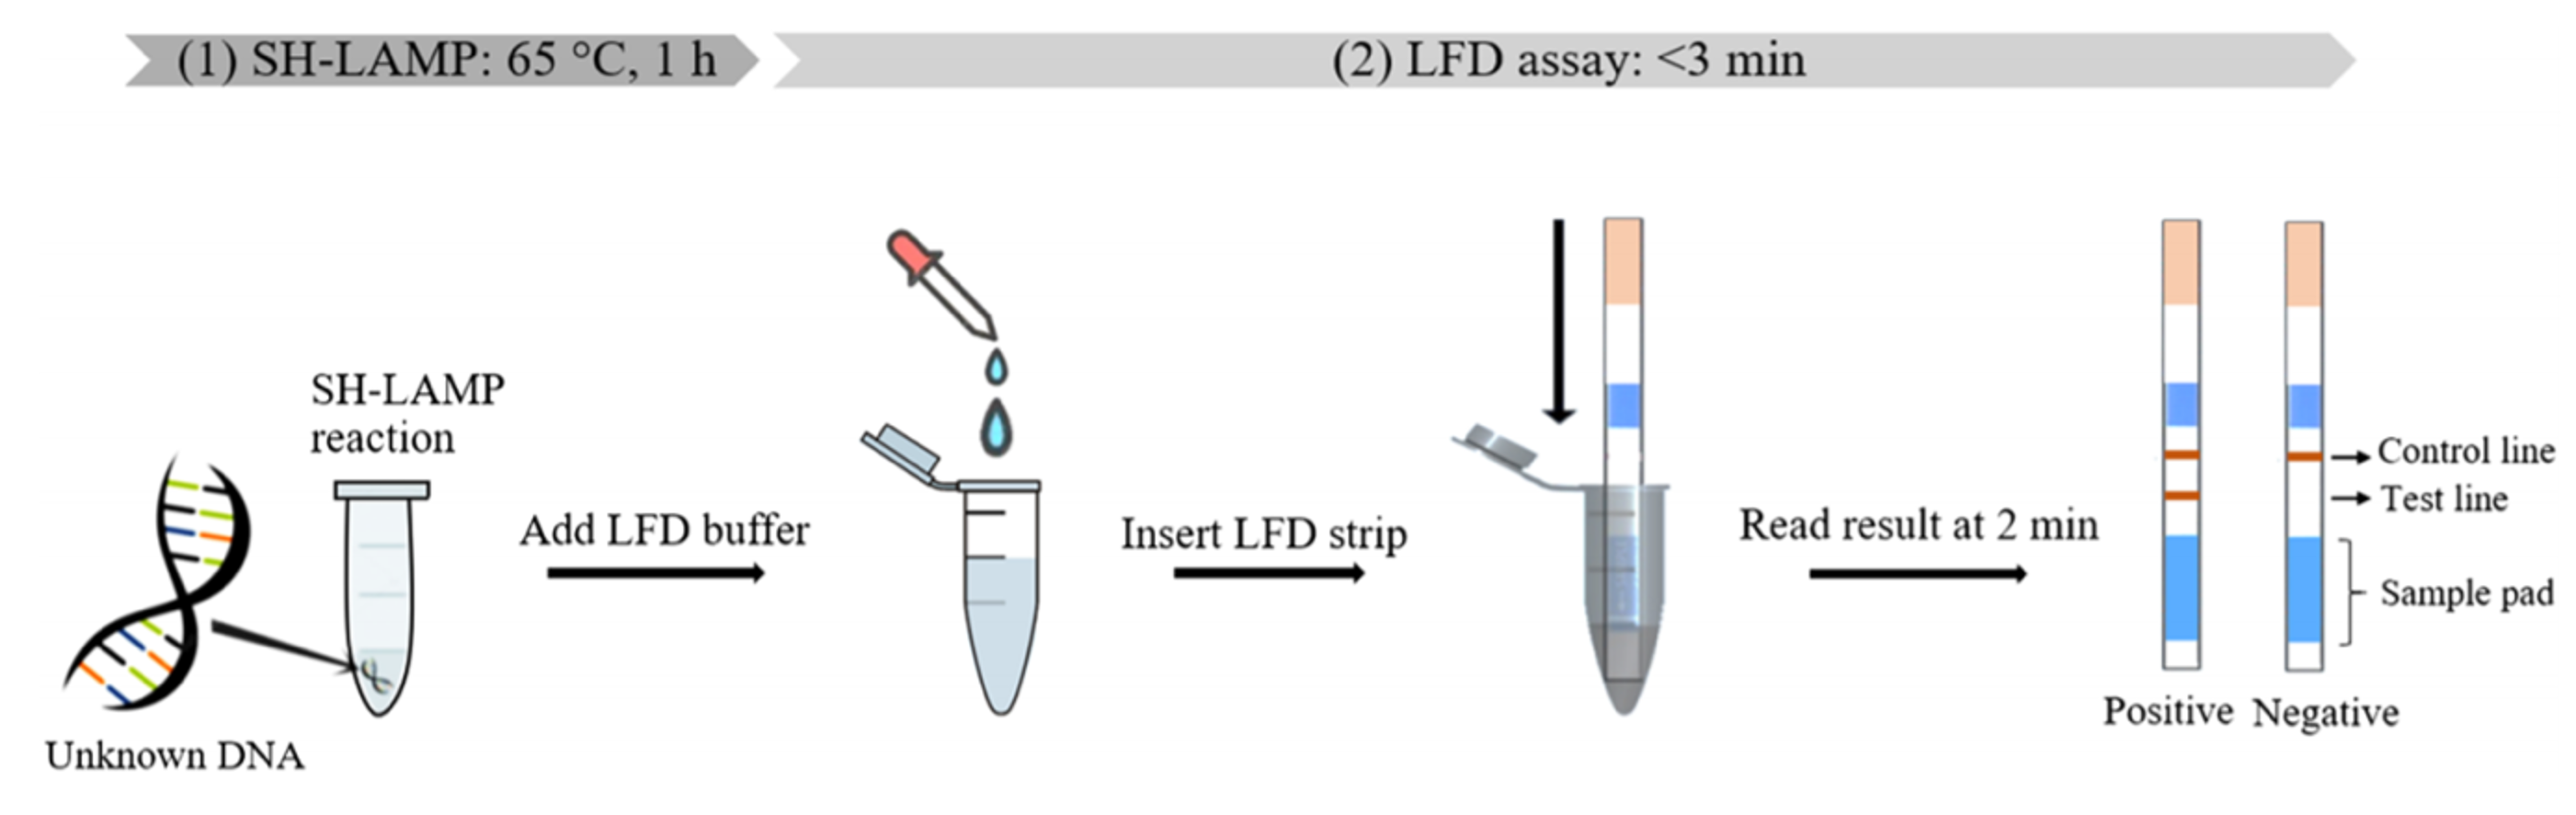 Figure 6. Workflow of LAMP-LFA using inLAMP-Hybridization